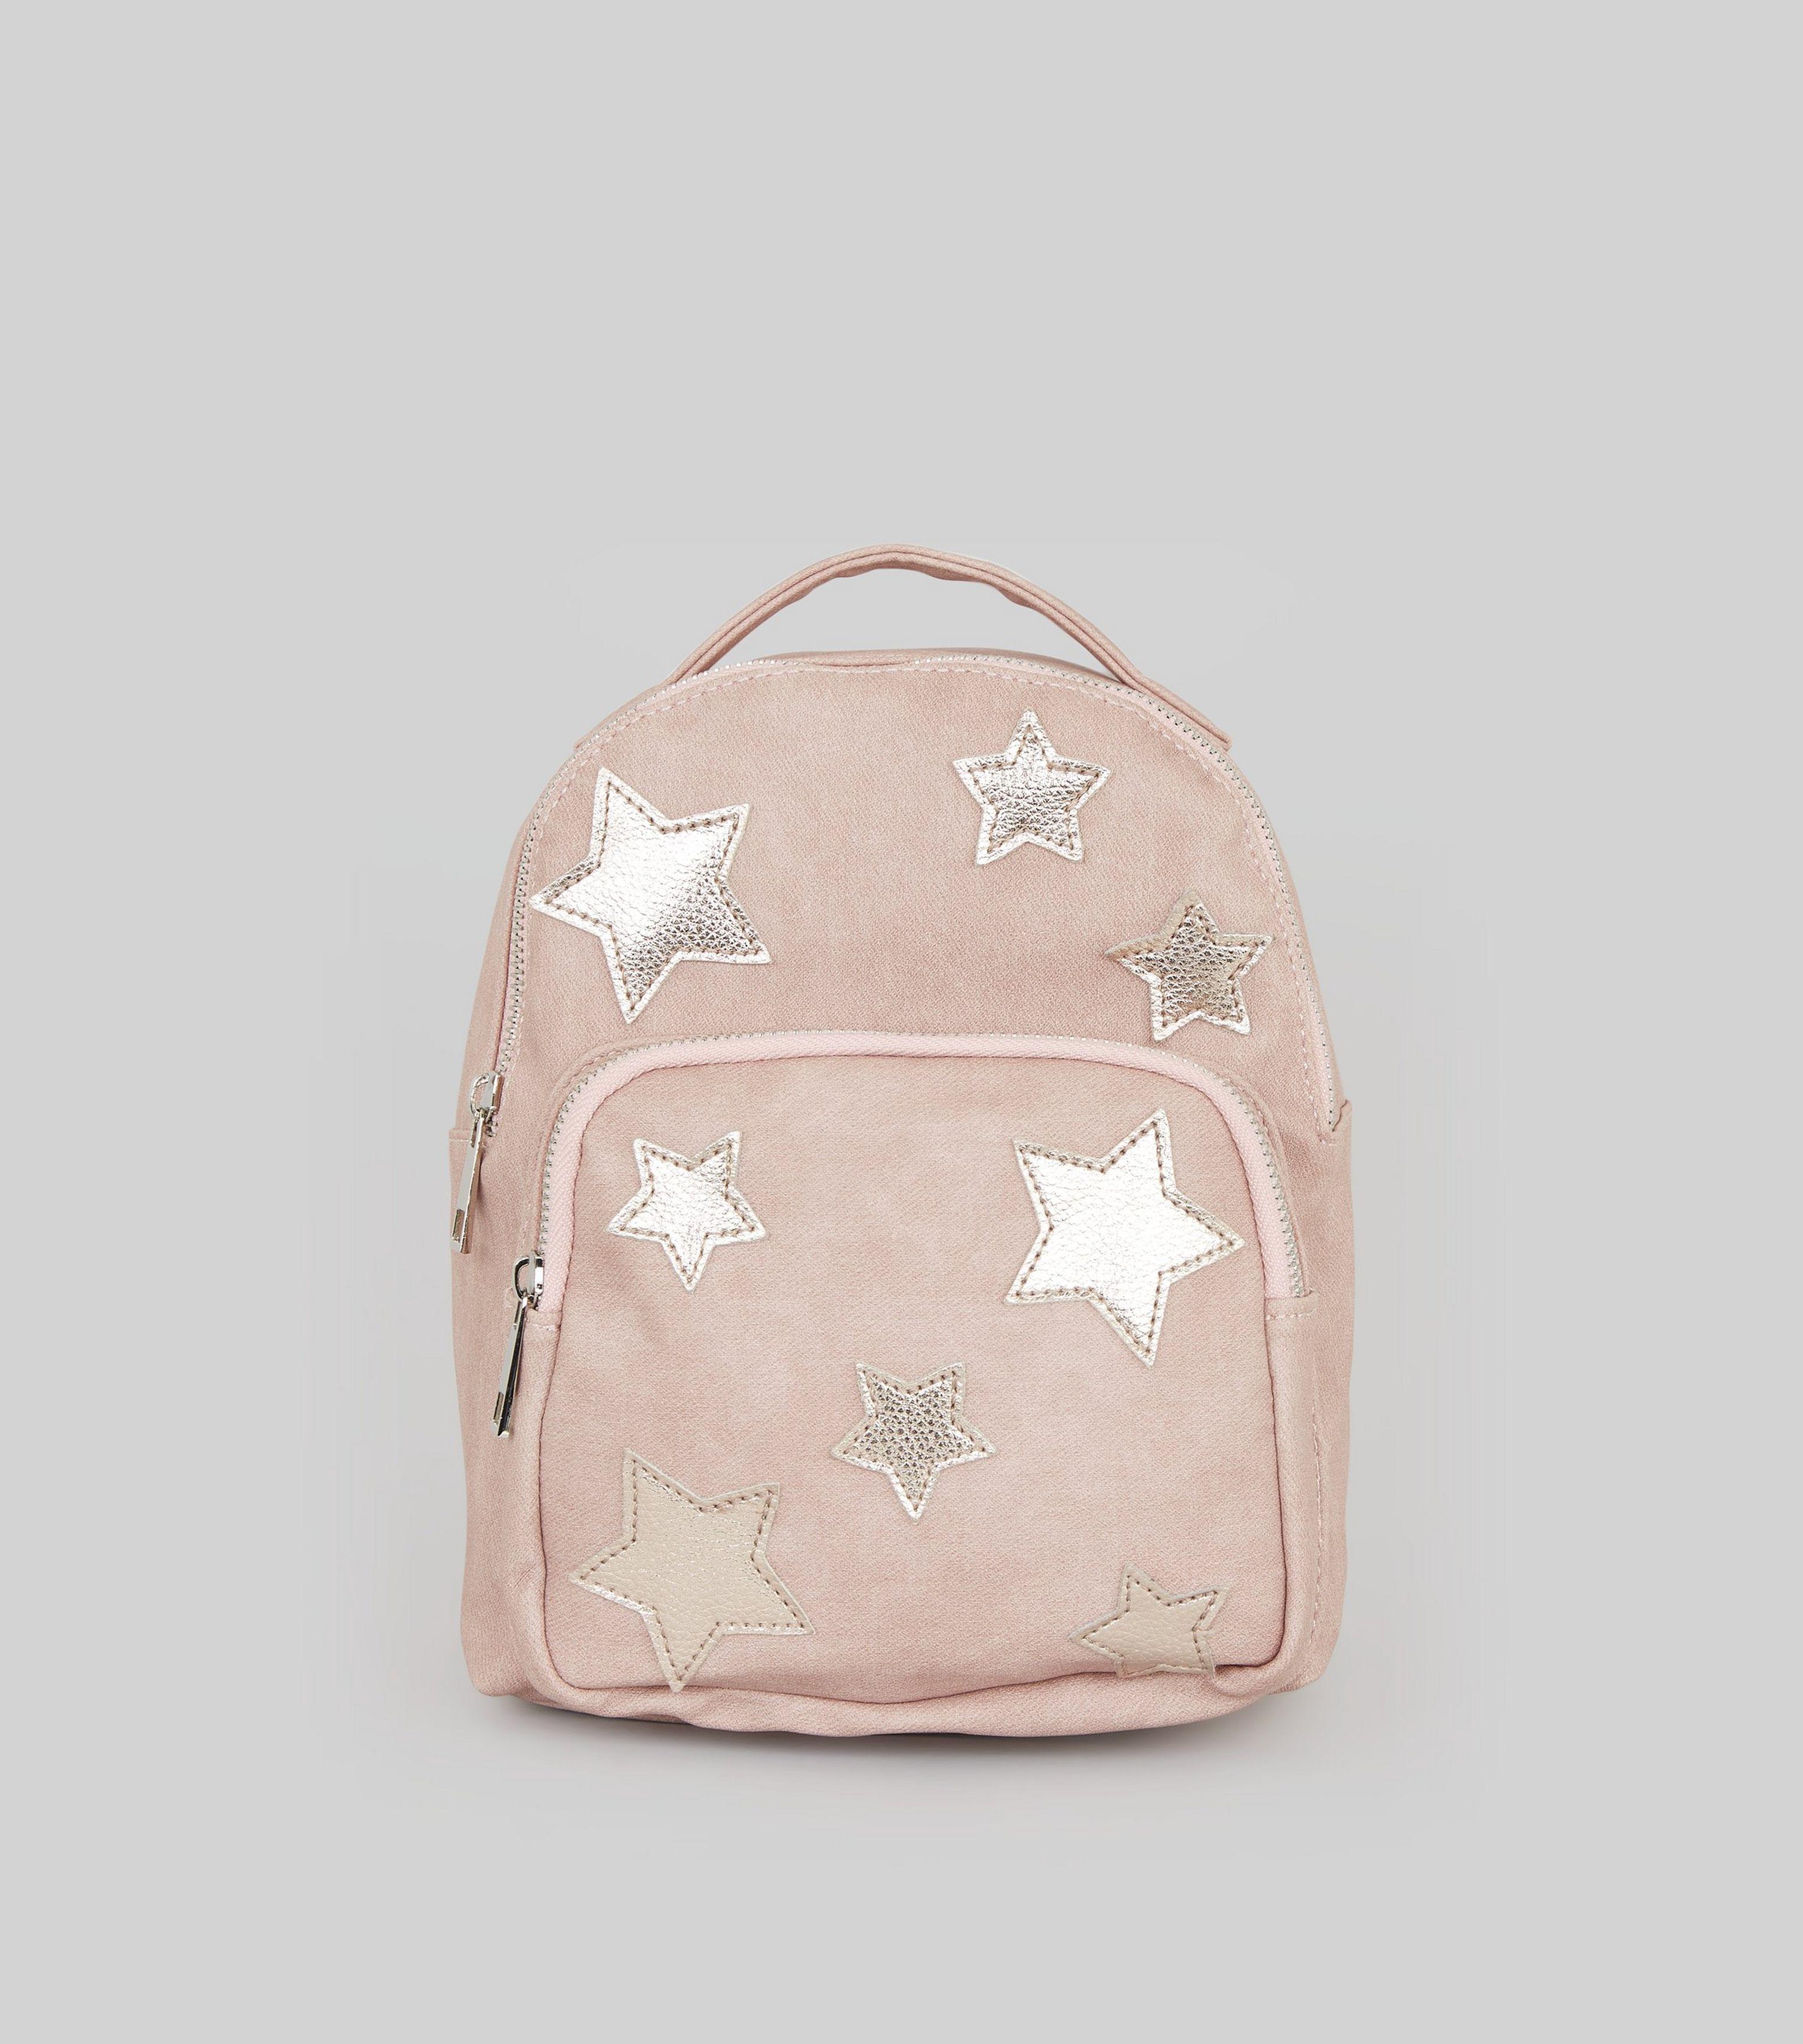 81a123663b Zara Pink Fluffy Backpack | Building Materials Bargain Center